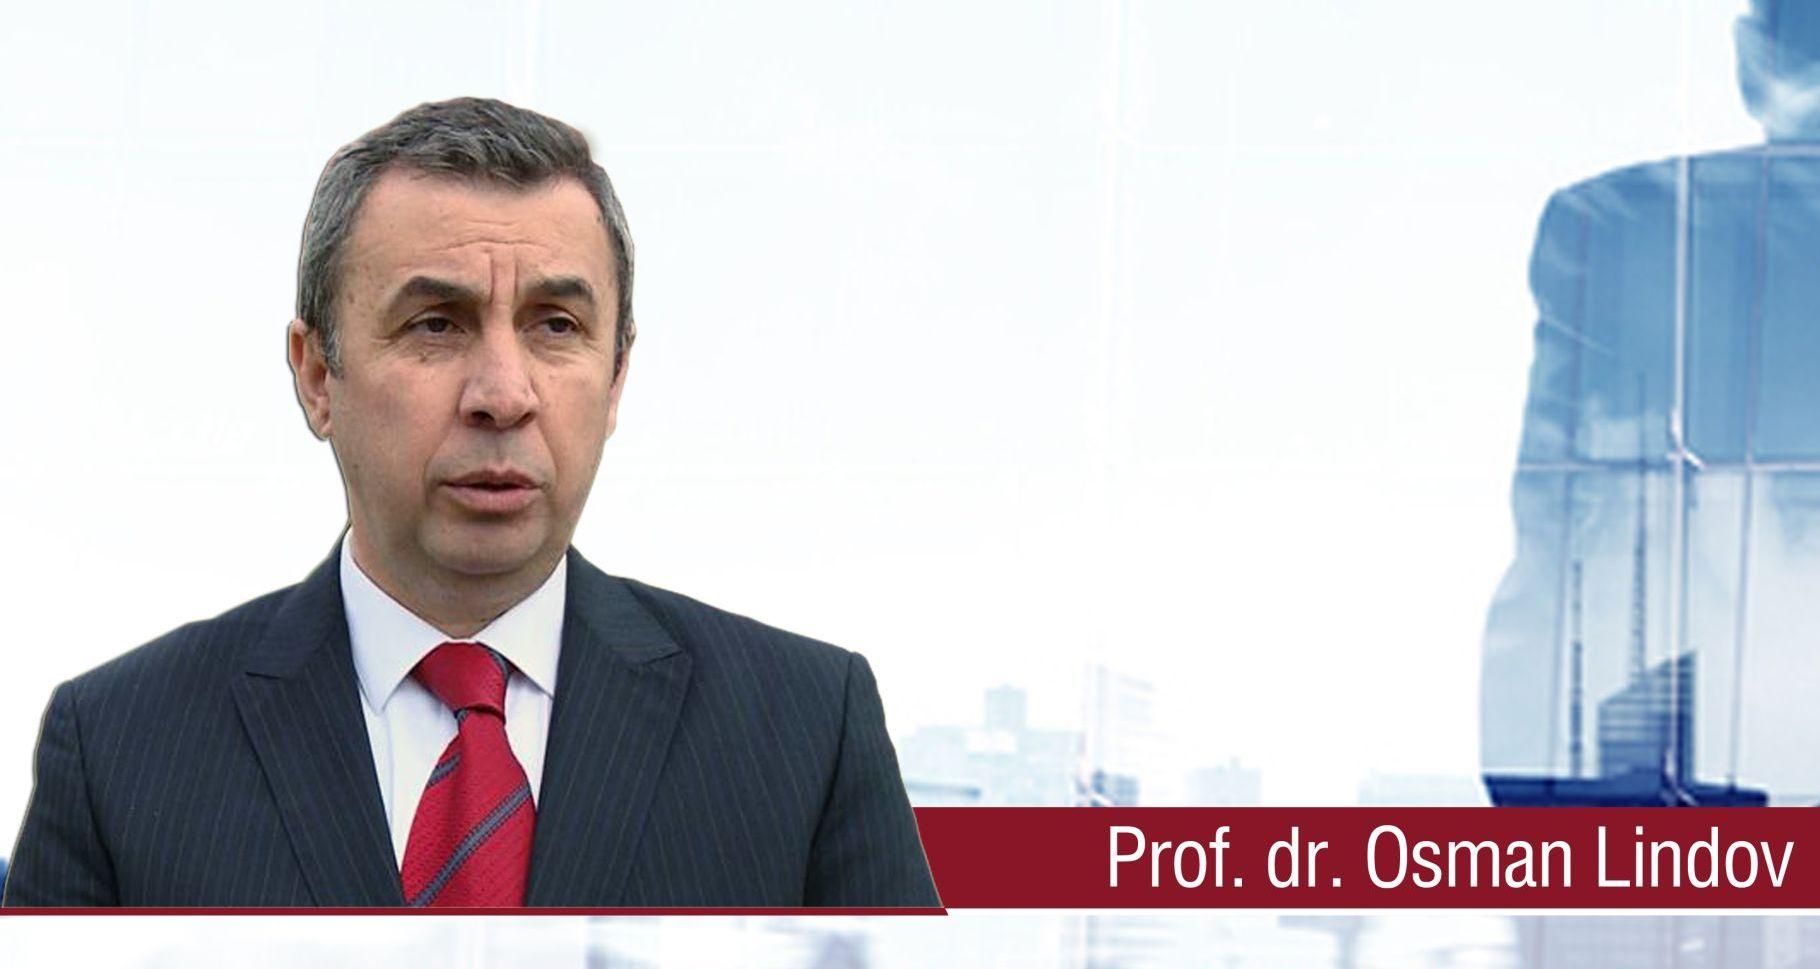 Osman Lindov april 2018 resiz jpg